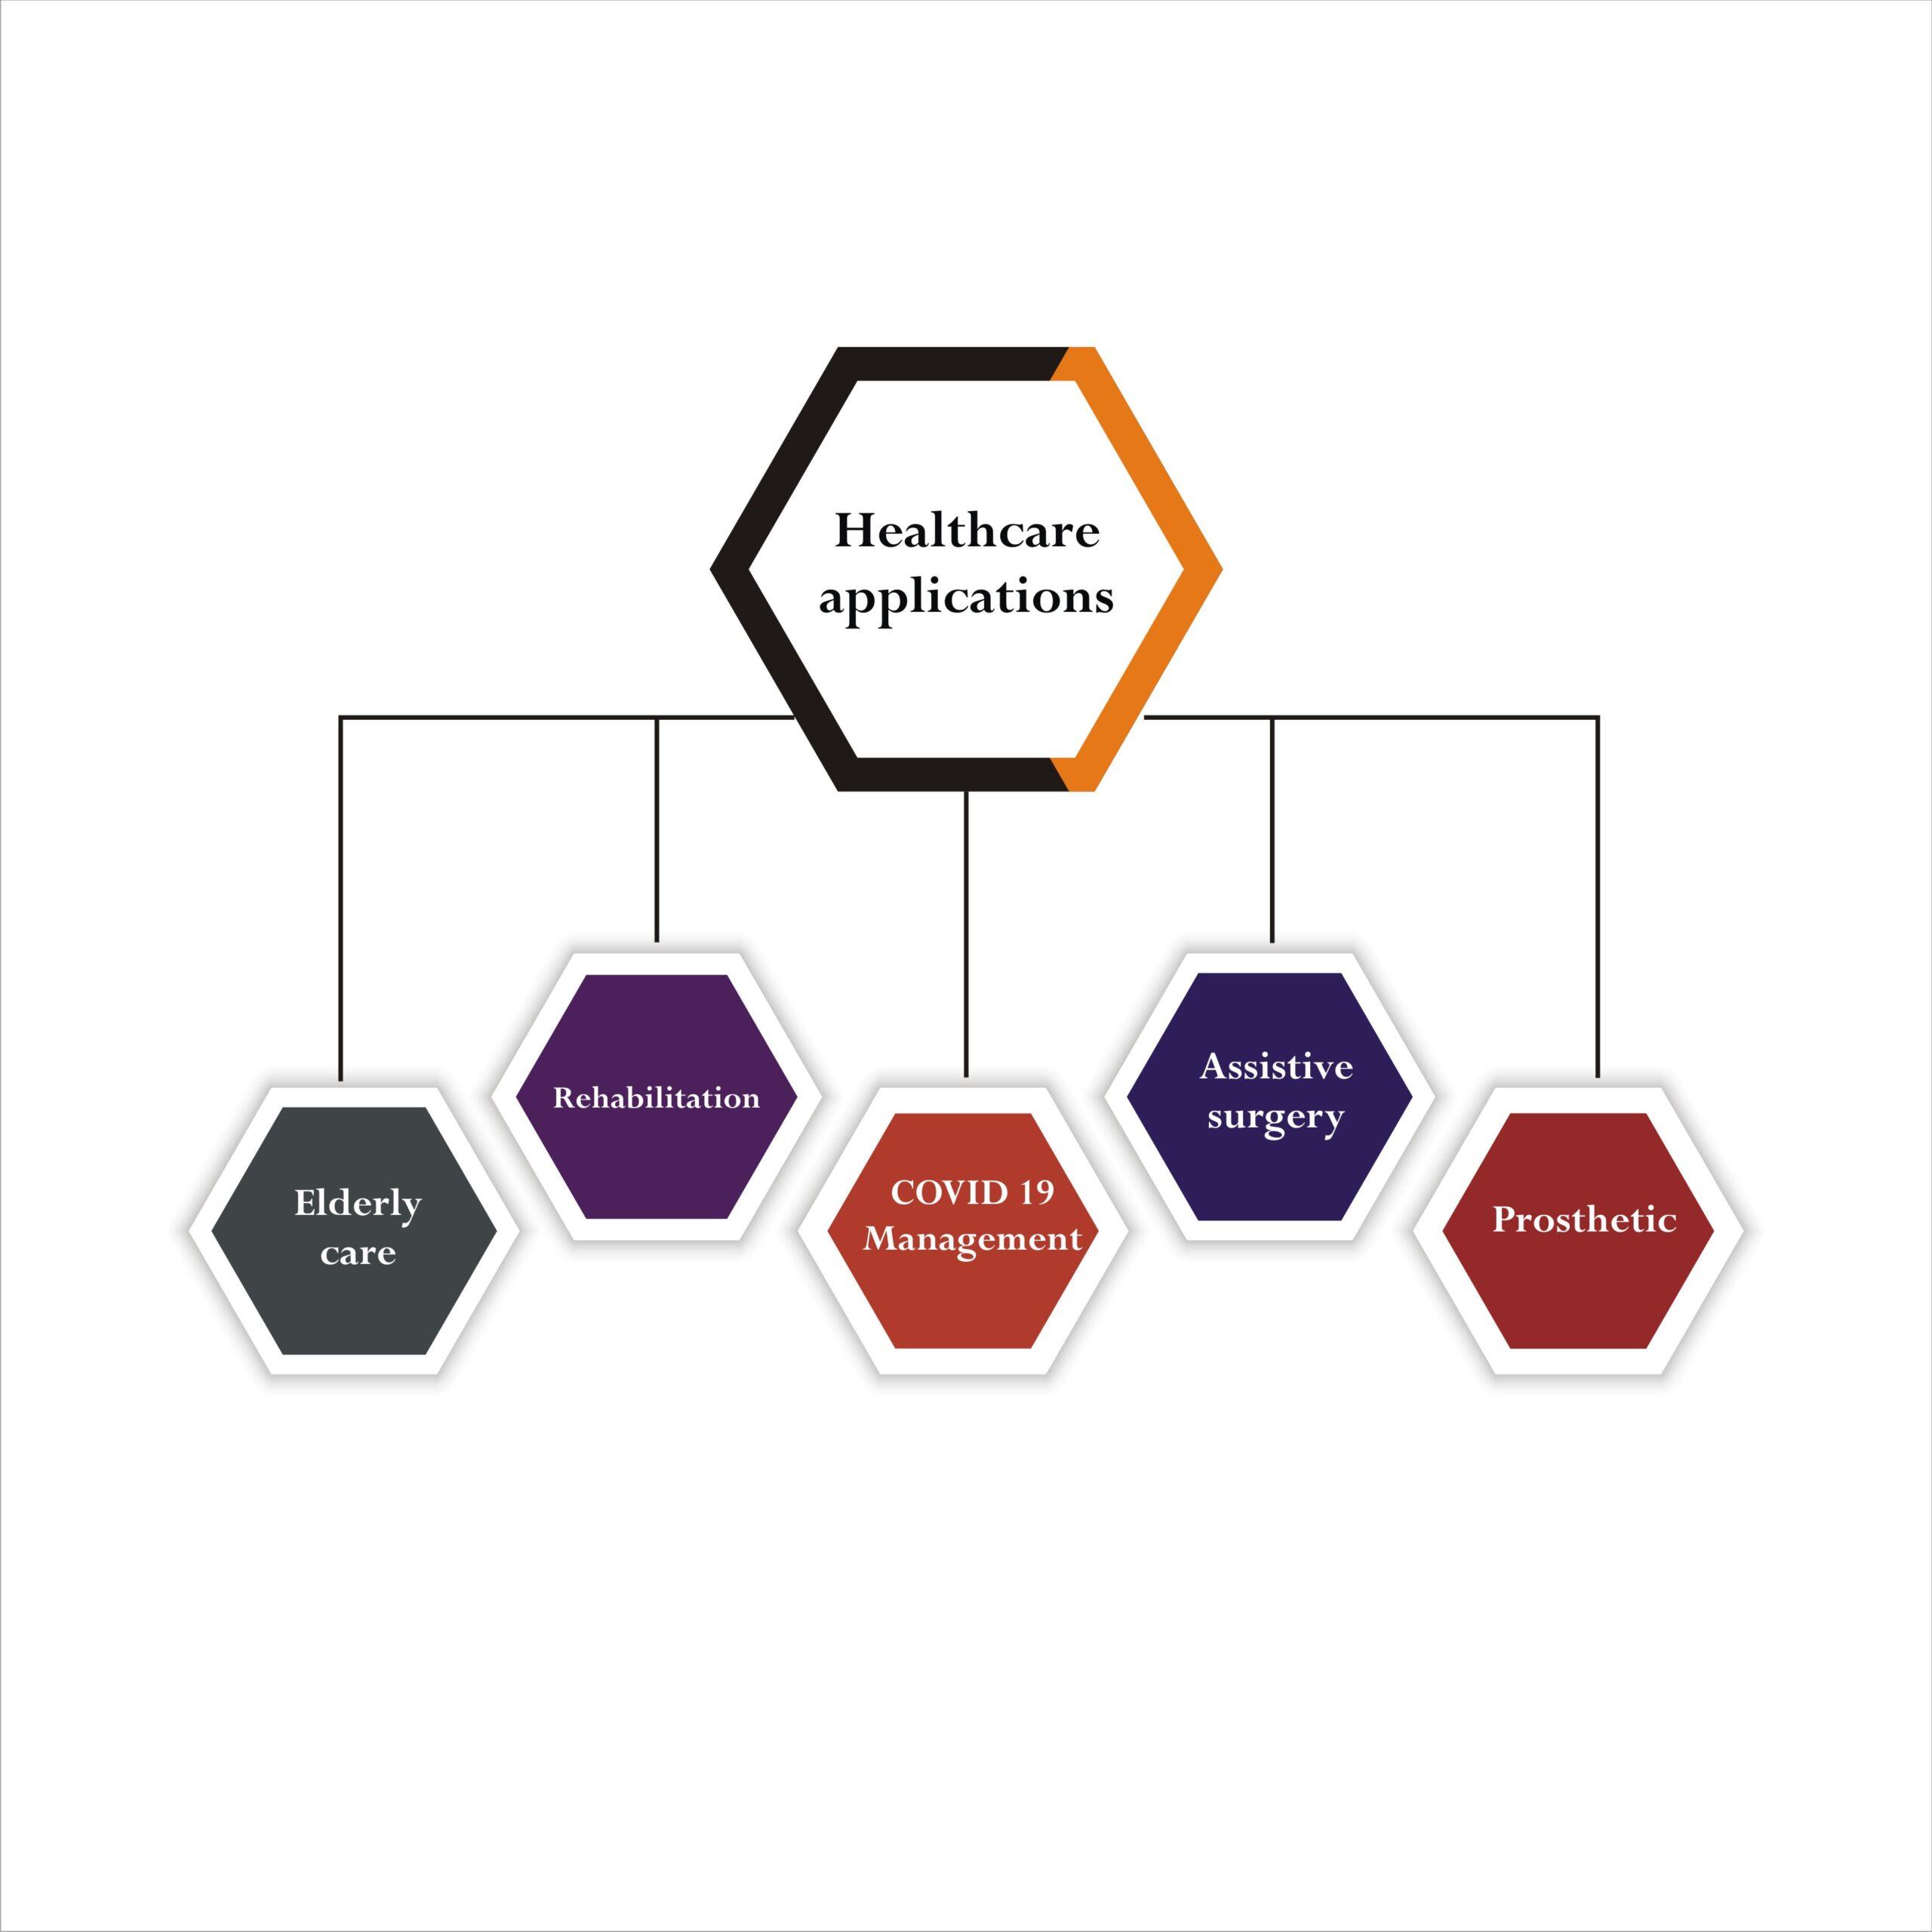 Applications of IoT robotics in Healthcare